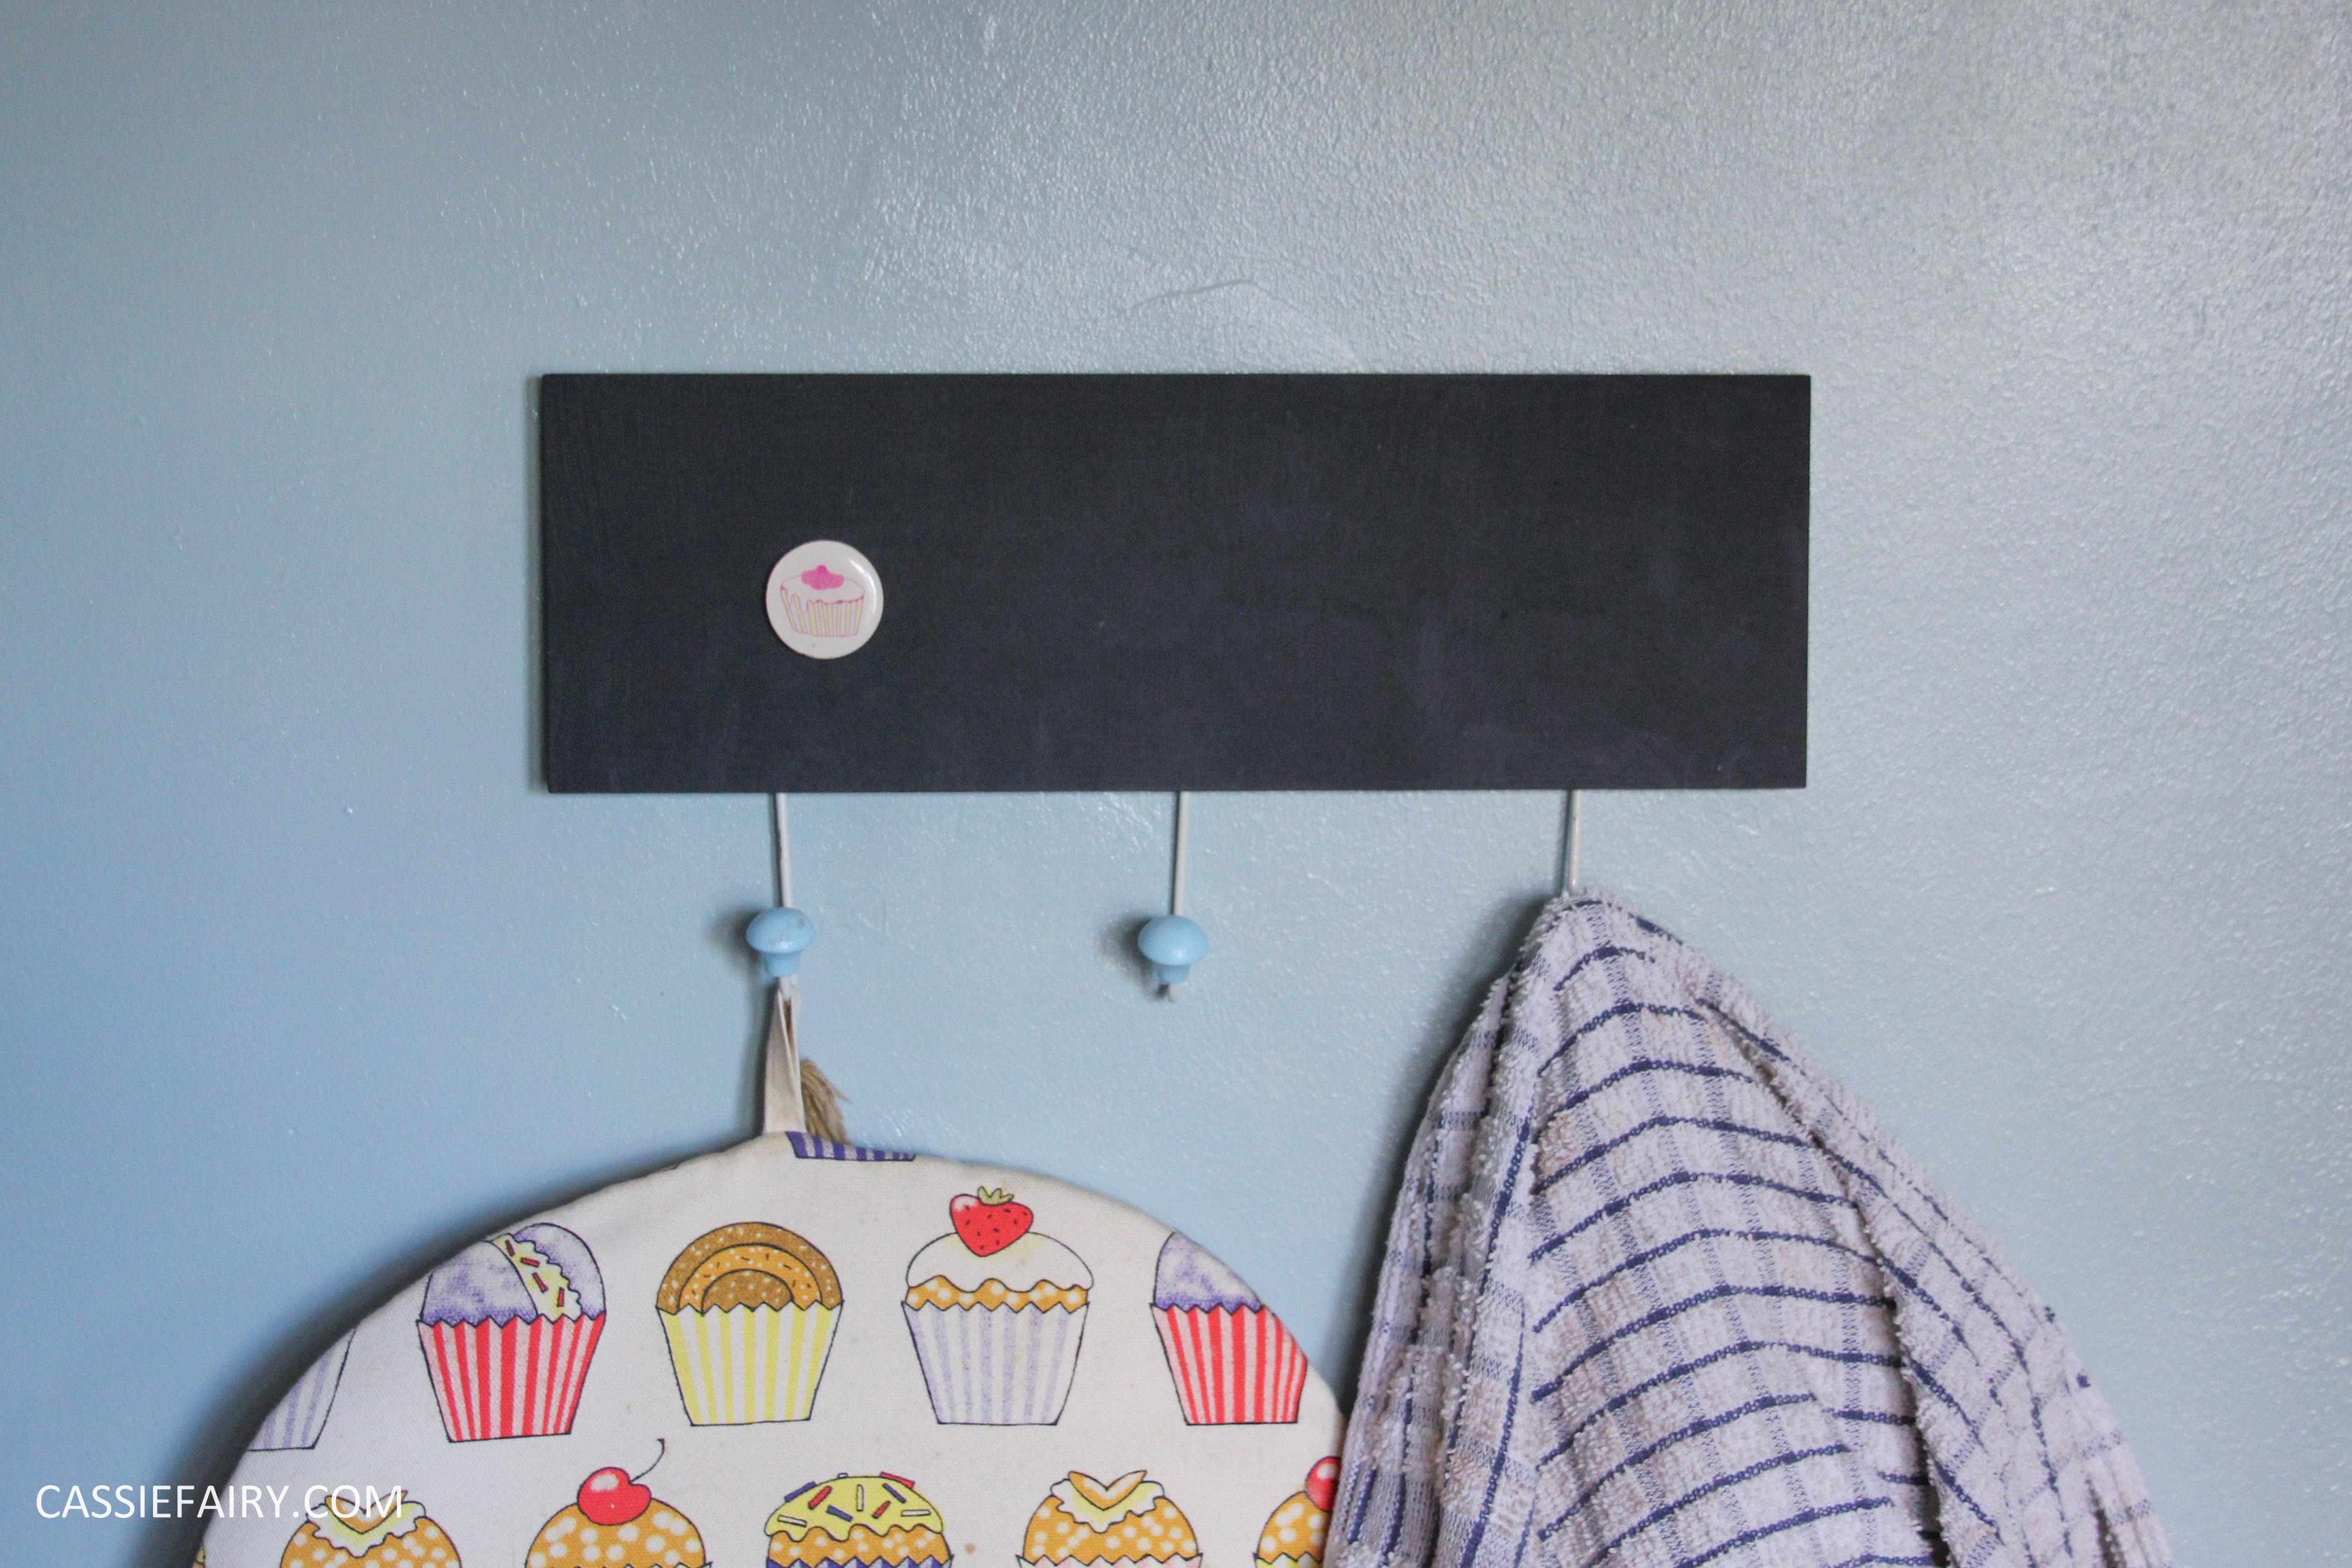 My mini kitchen makeover - DIY chalkboard walls & bright accessories